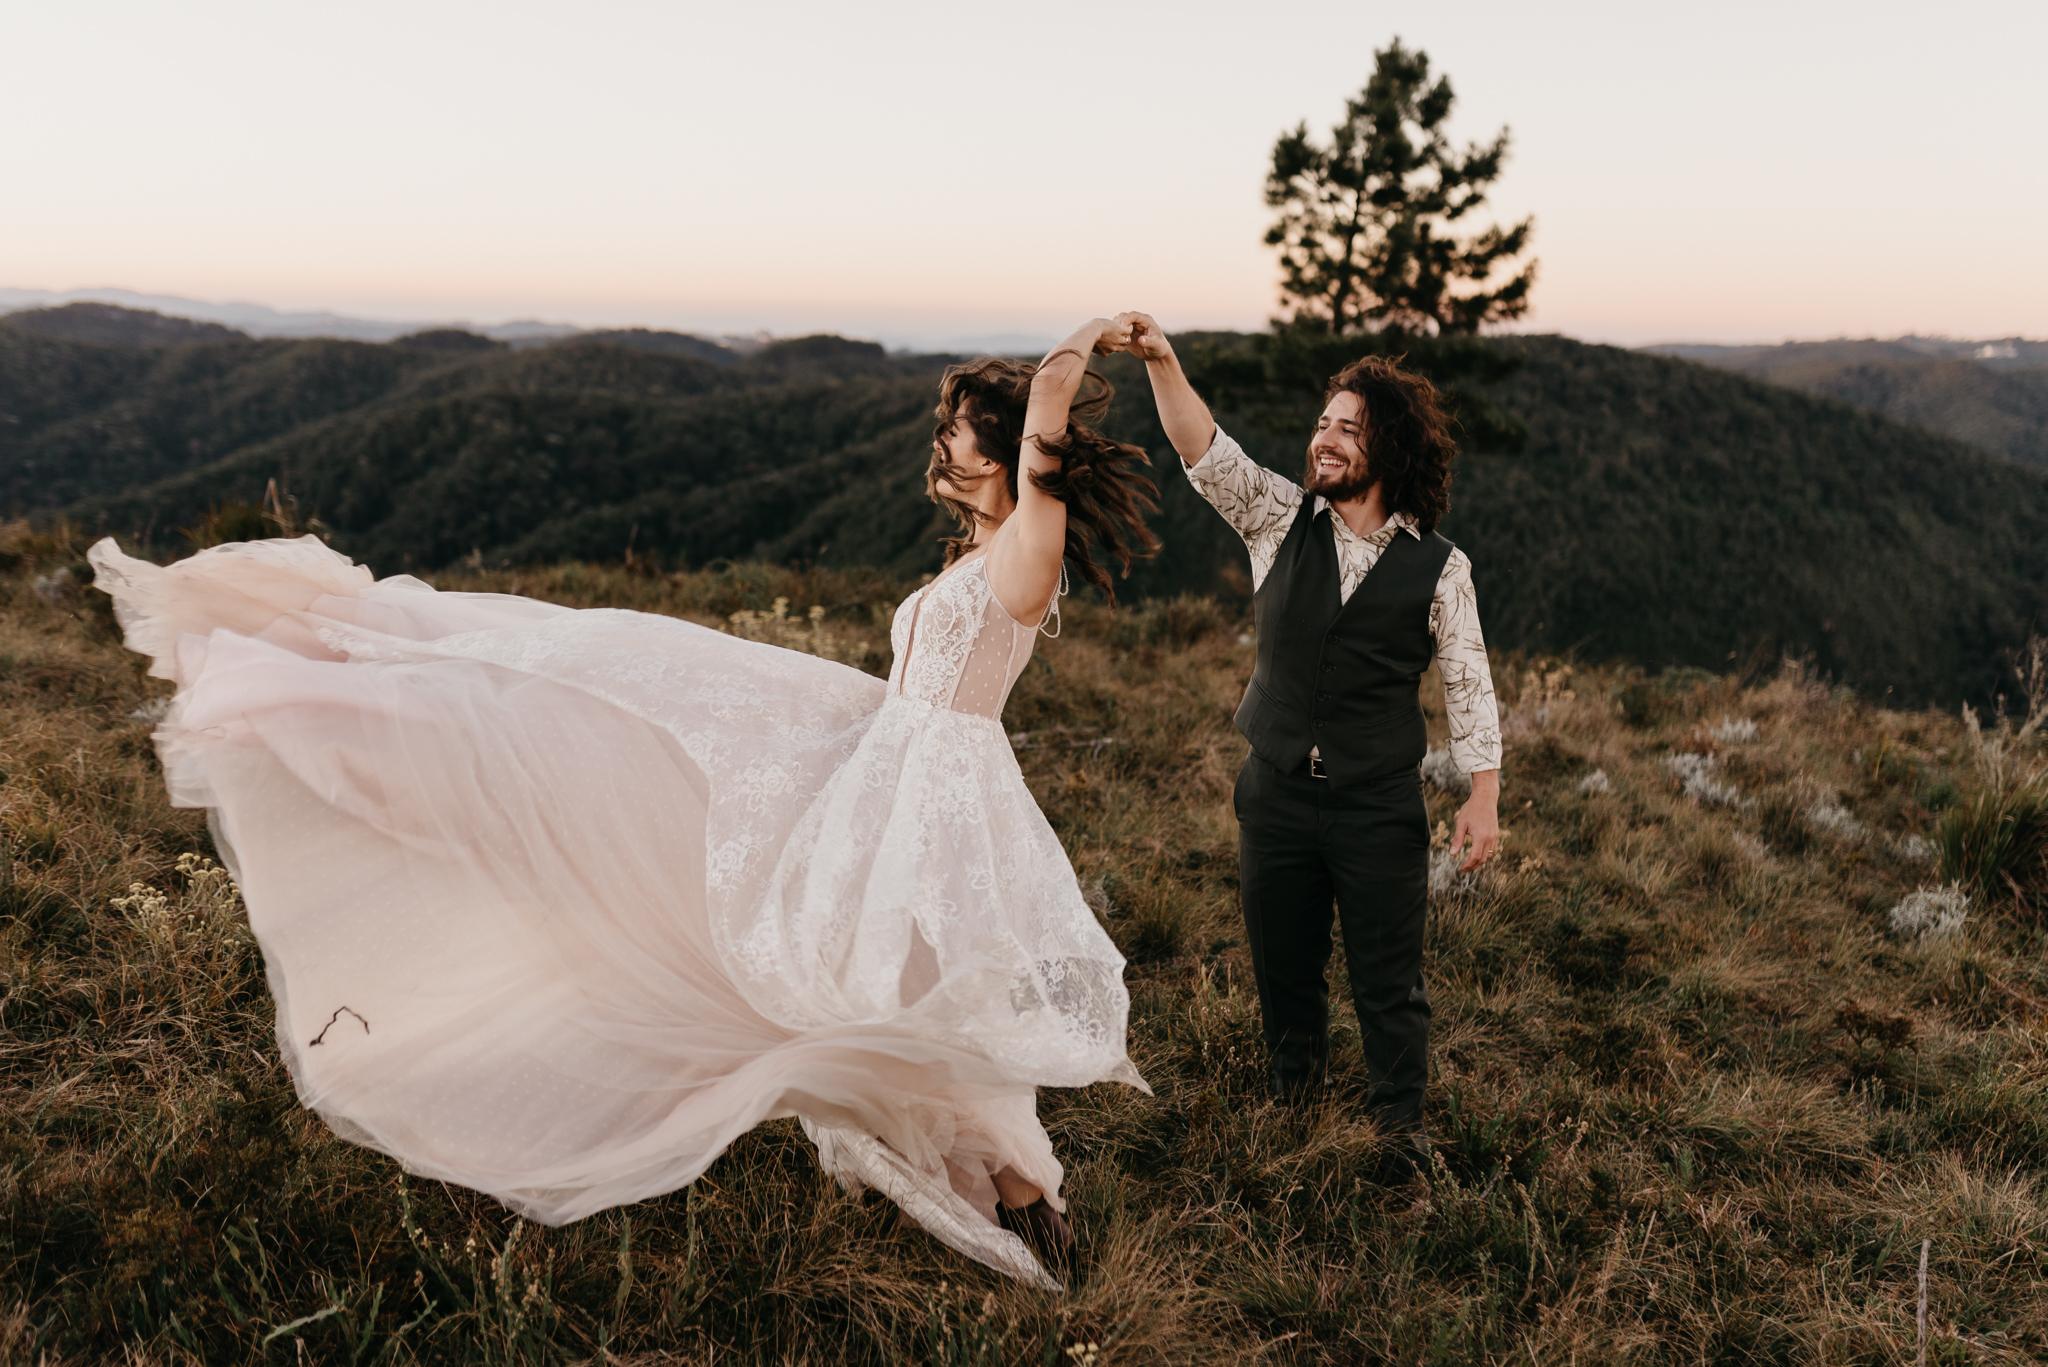 Contate Fotógrafo de casamentos, Mini Wedding e família, SP | Thiago Farias